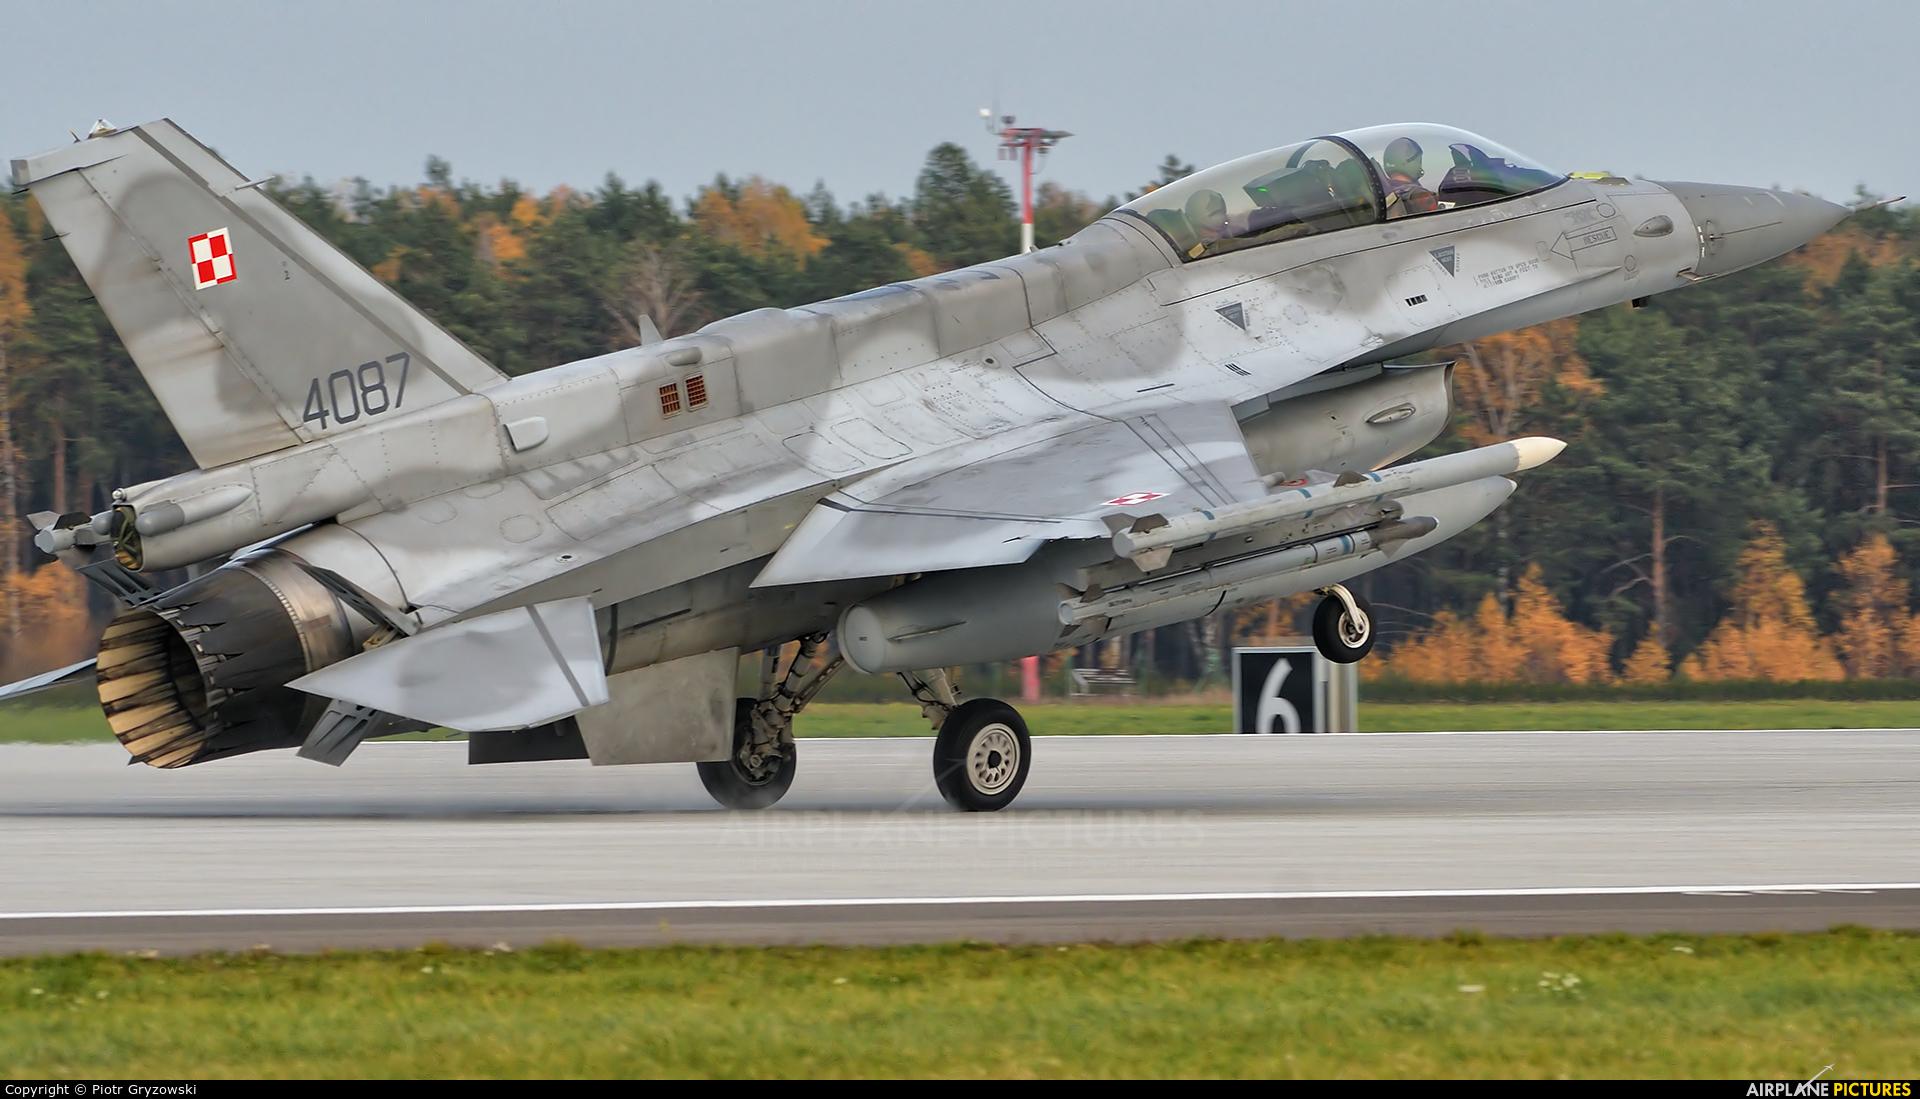 Poland - Air Force 4087 aircraft at Łask AB